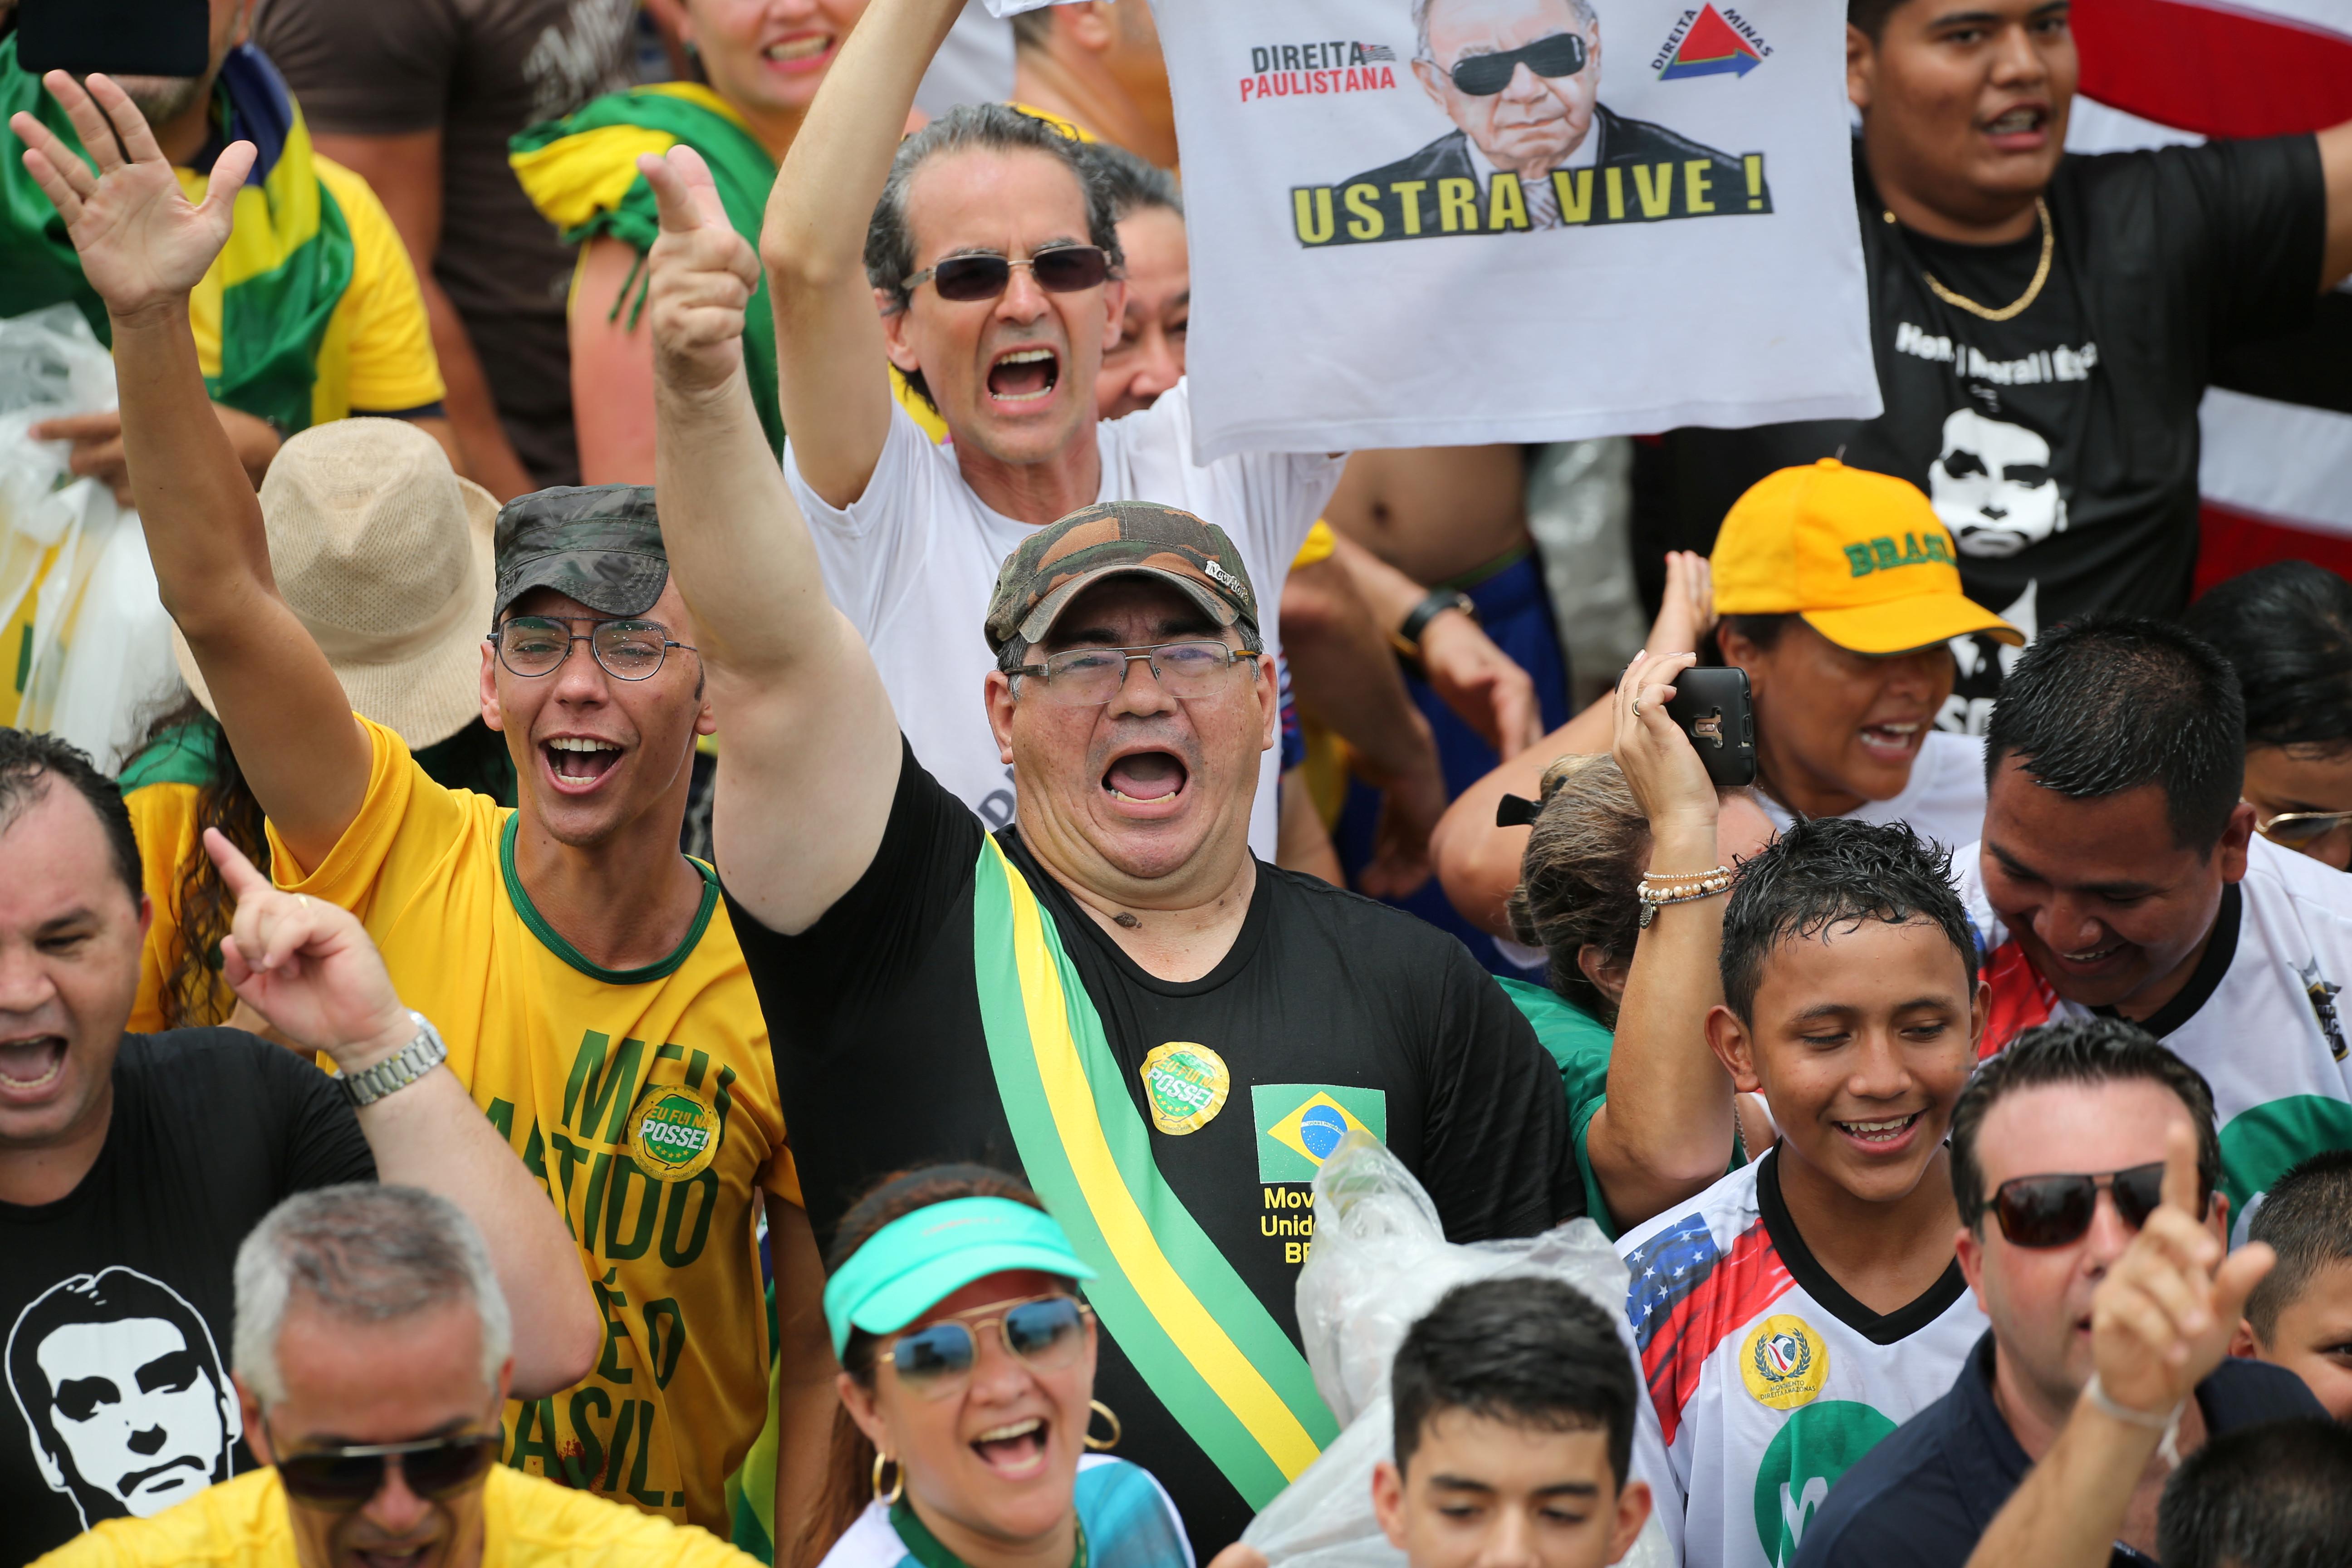 Supporters of Brazil's new populist president, Jair Bolsonaro.